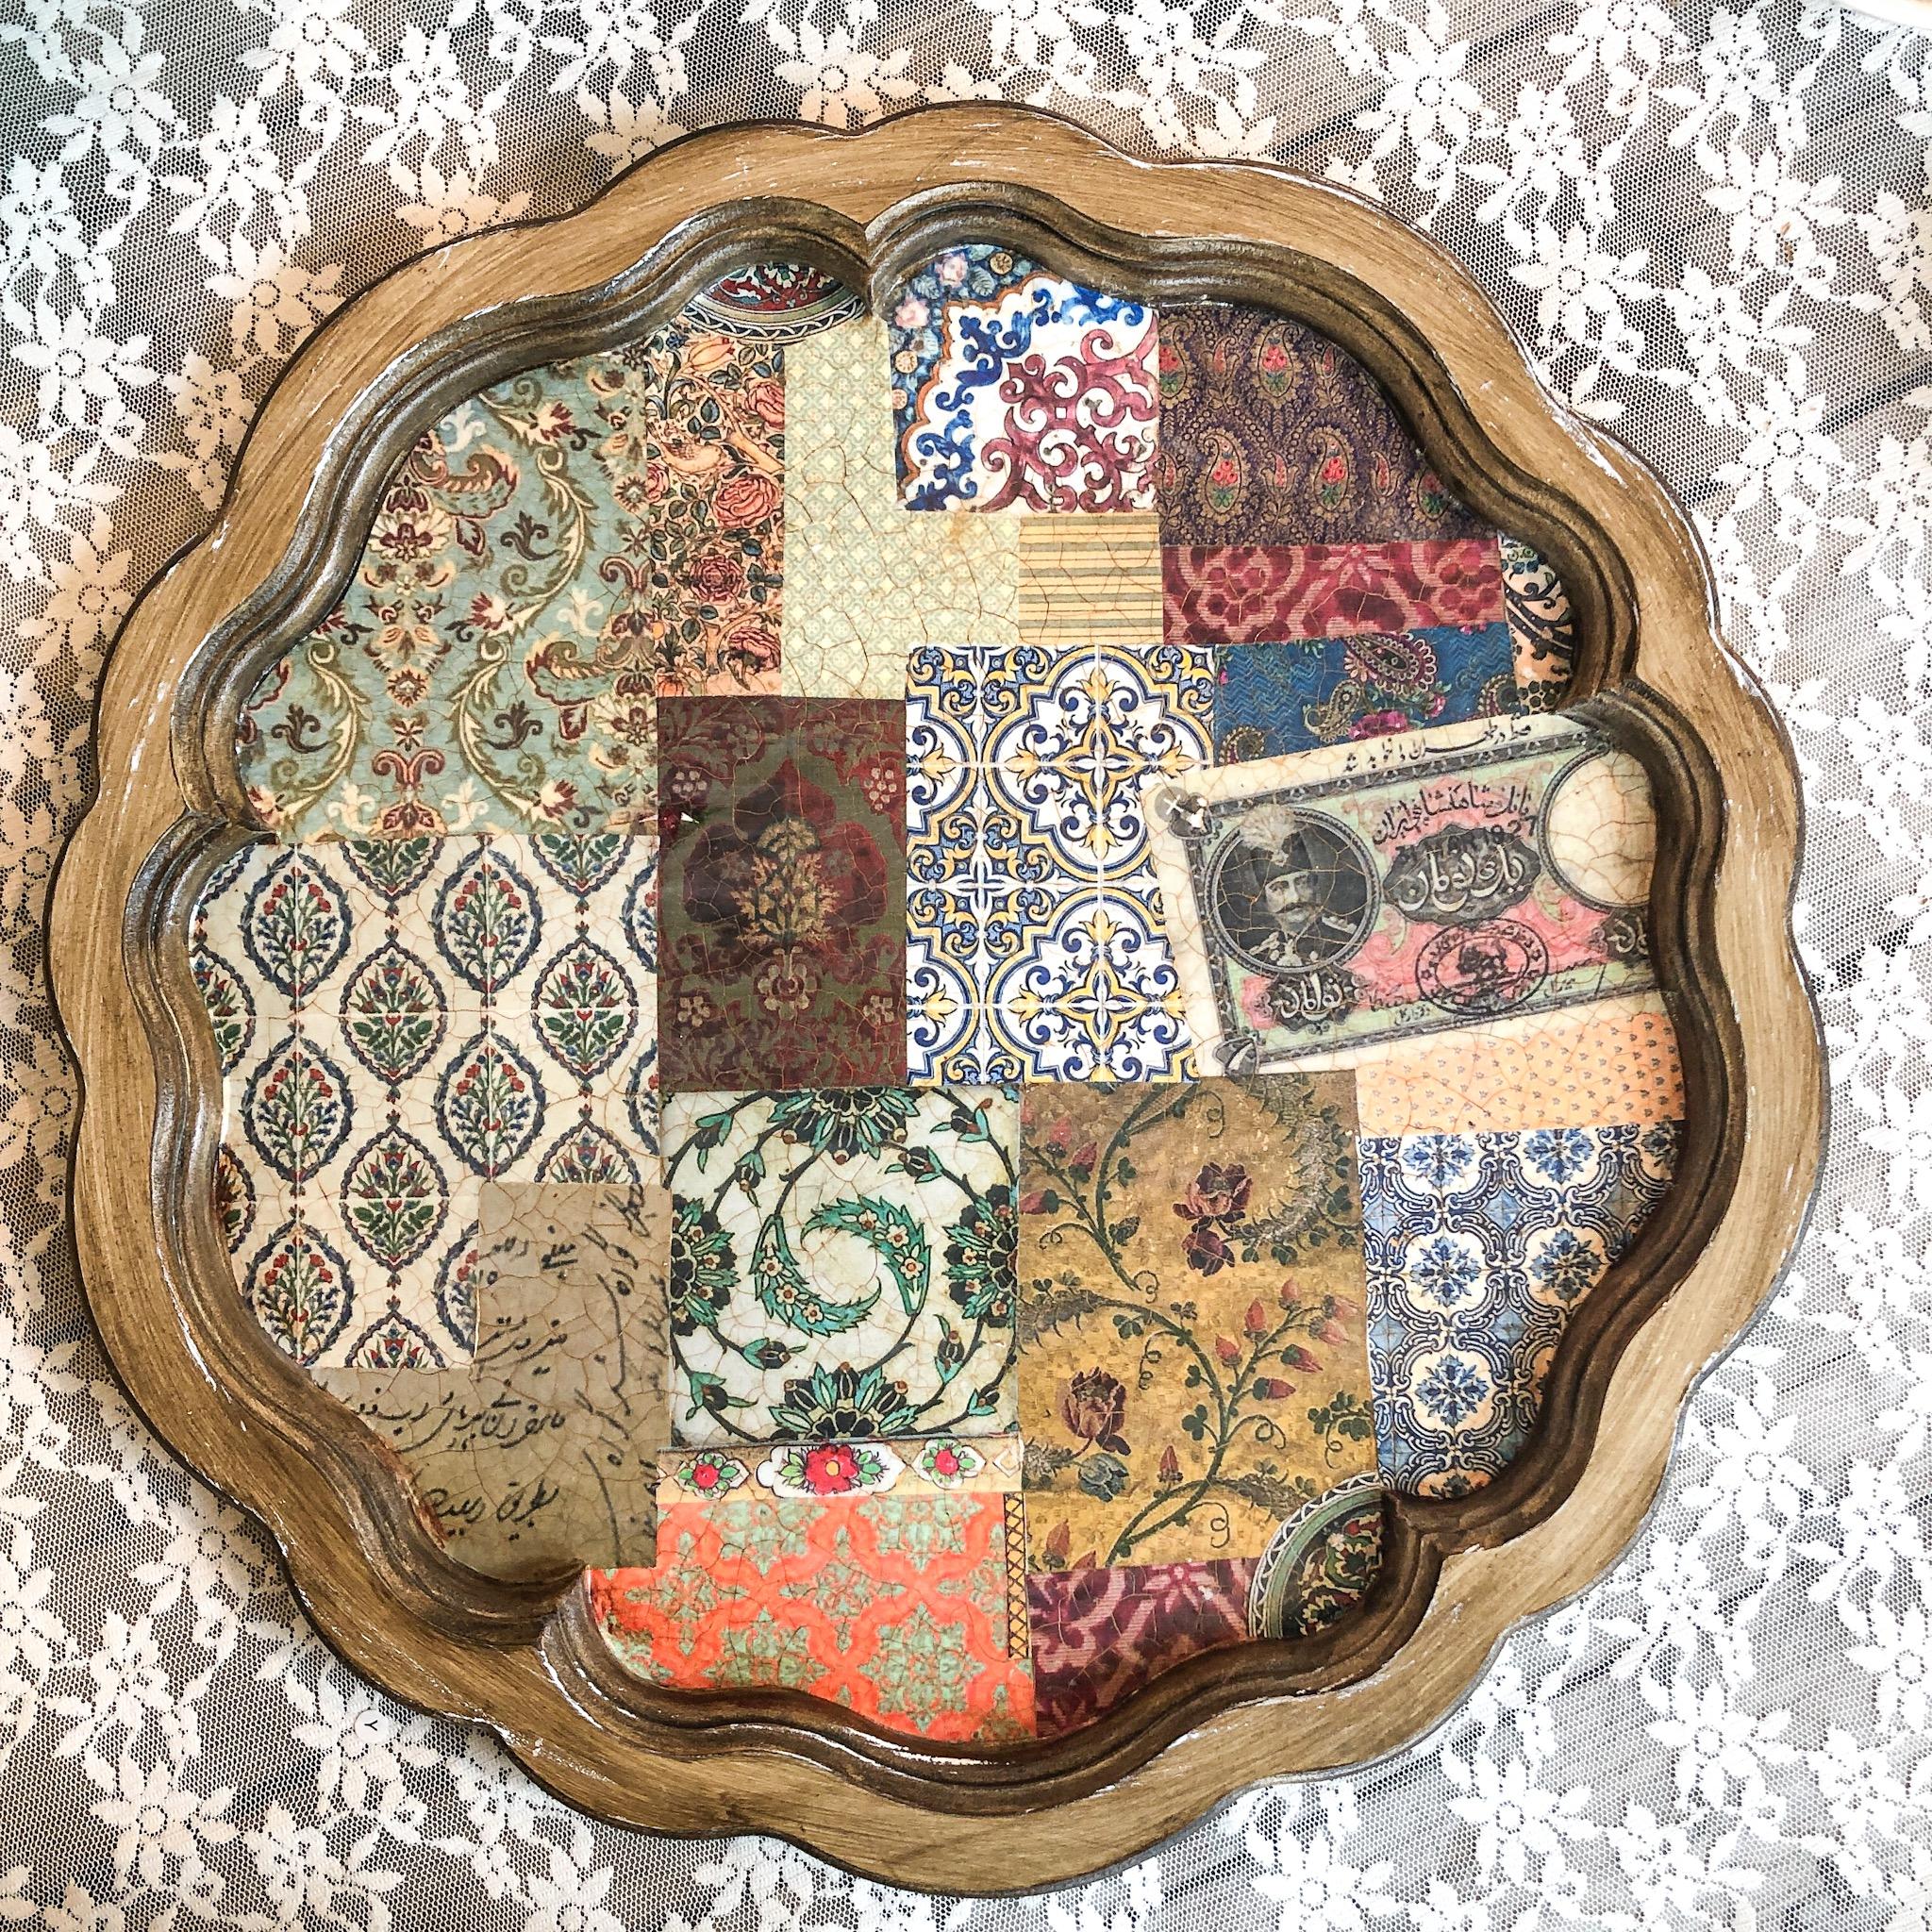 Nabat handmade wooden tray dalbor 43 cm eskenas